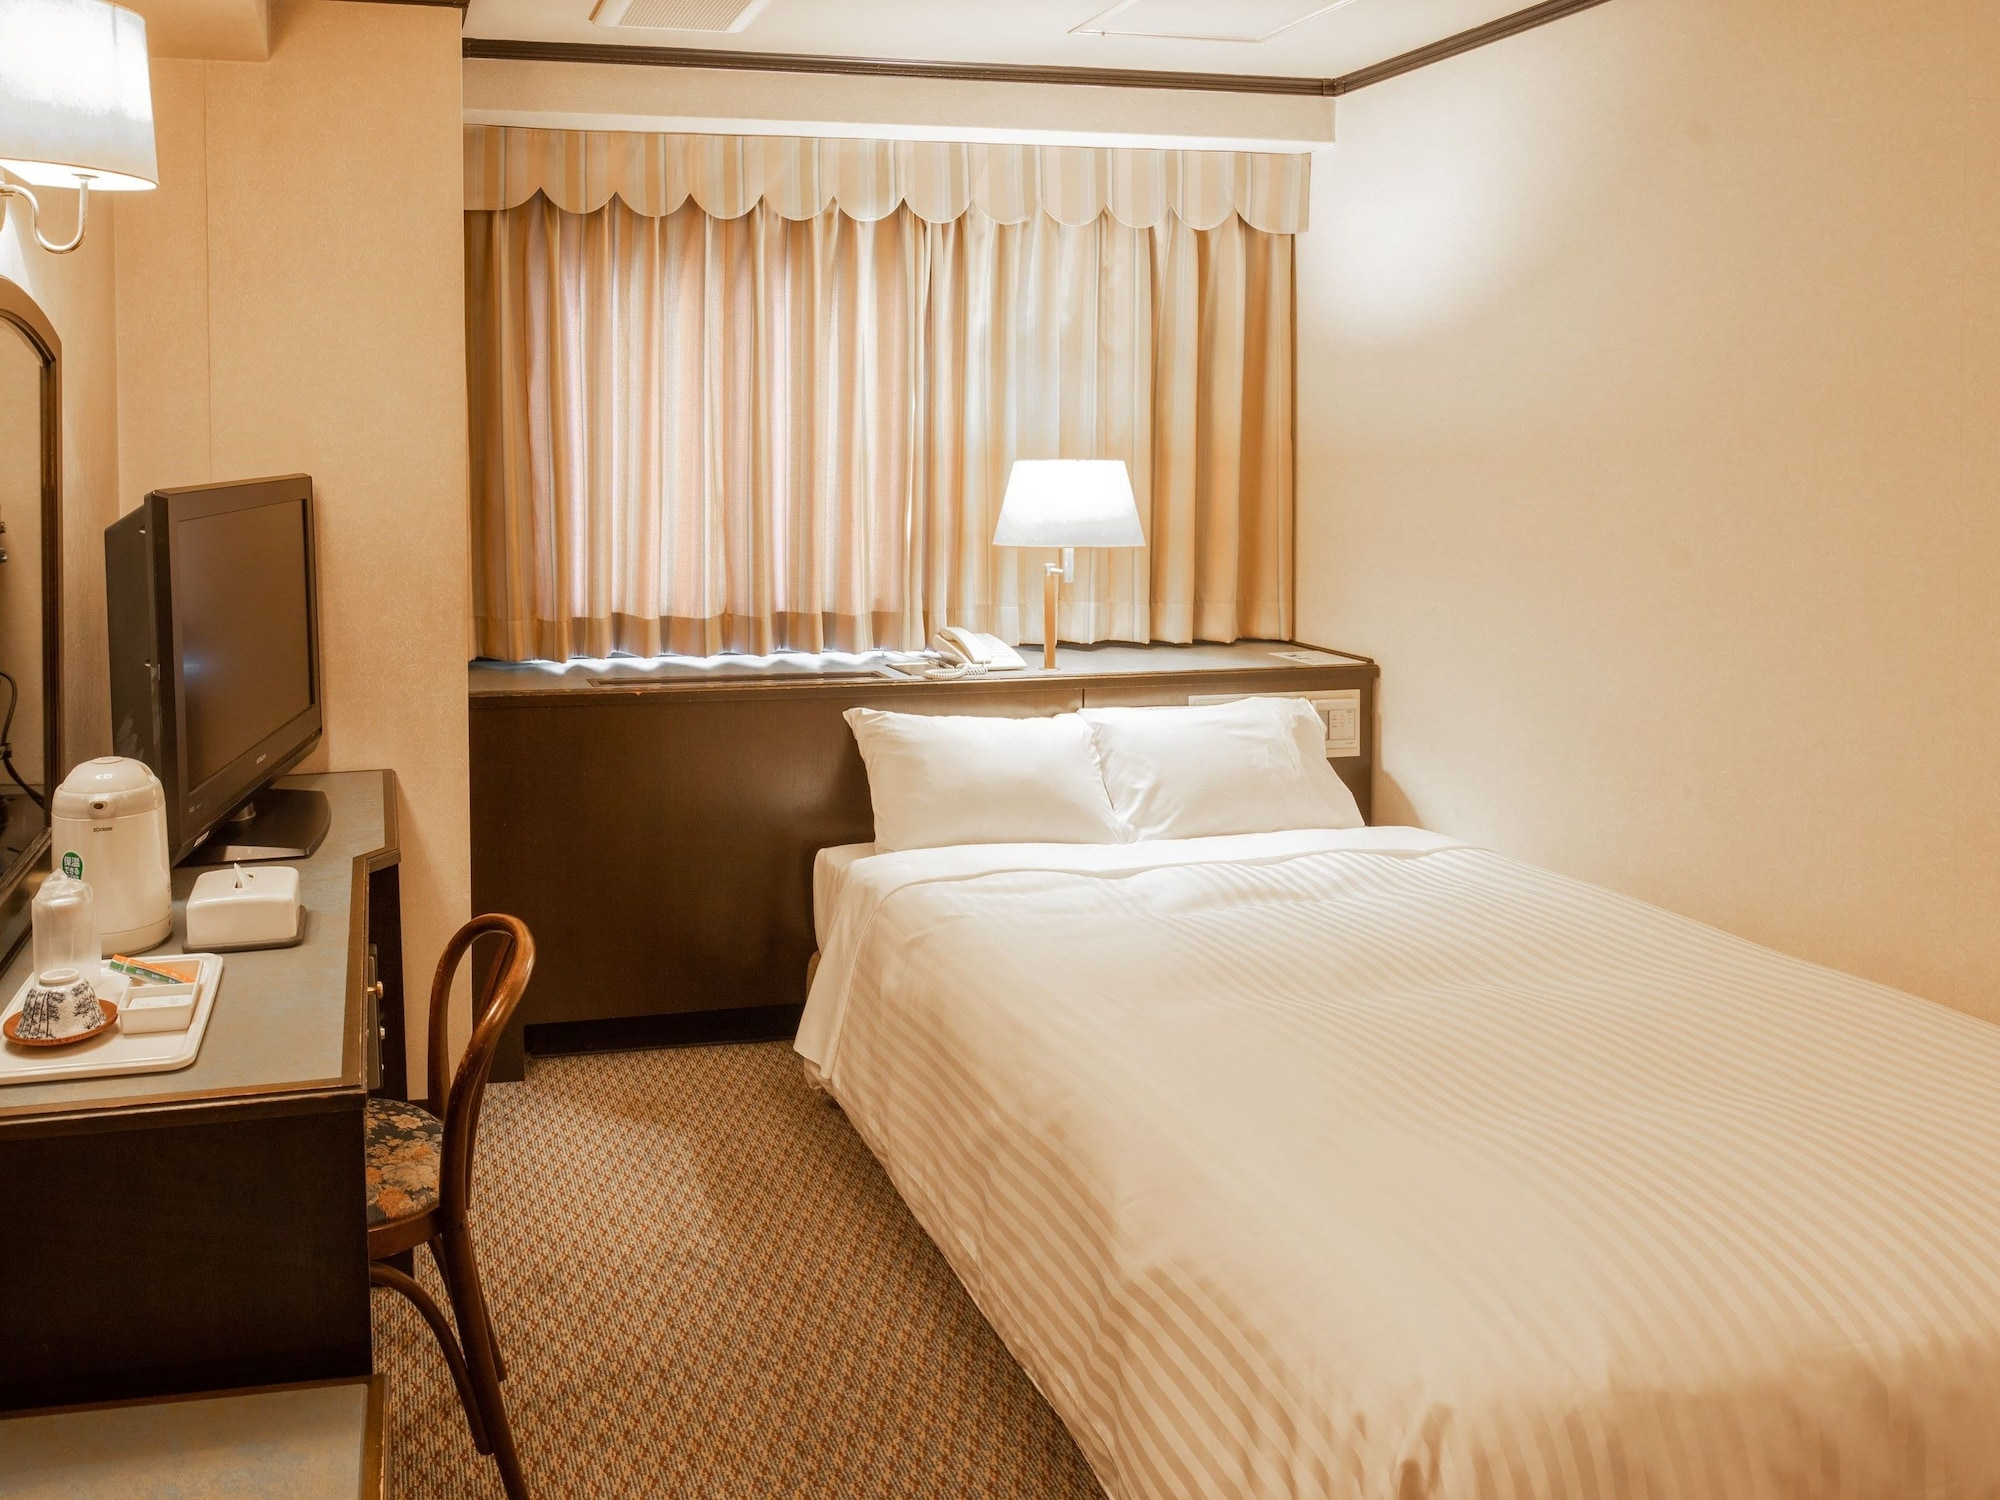 Hotel Castle inn Suzuka, Suzuka